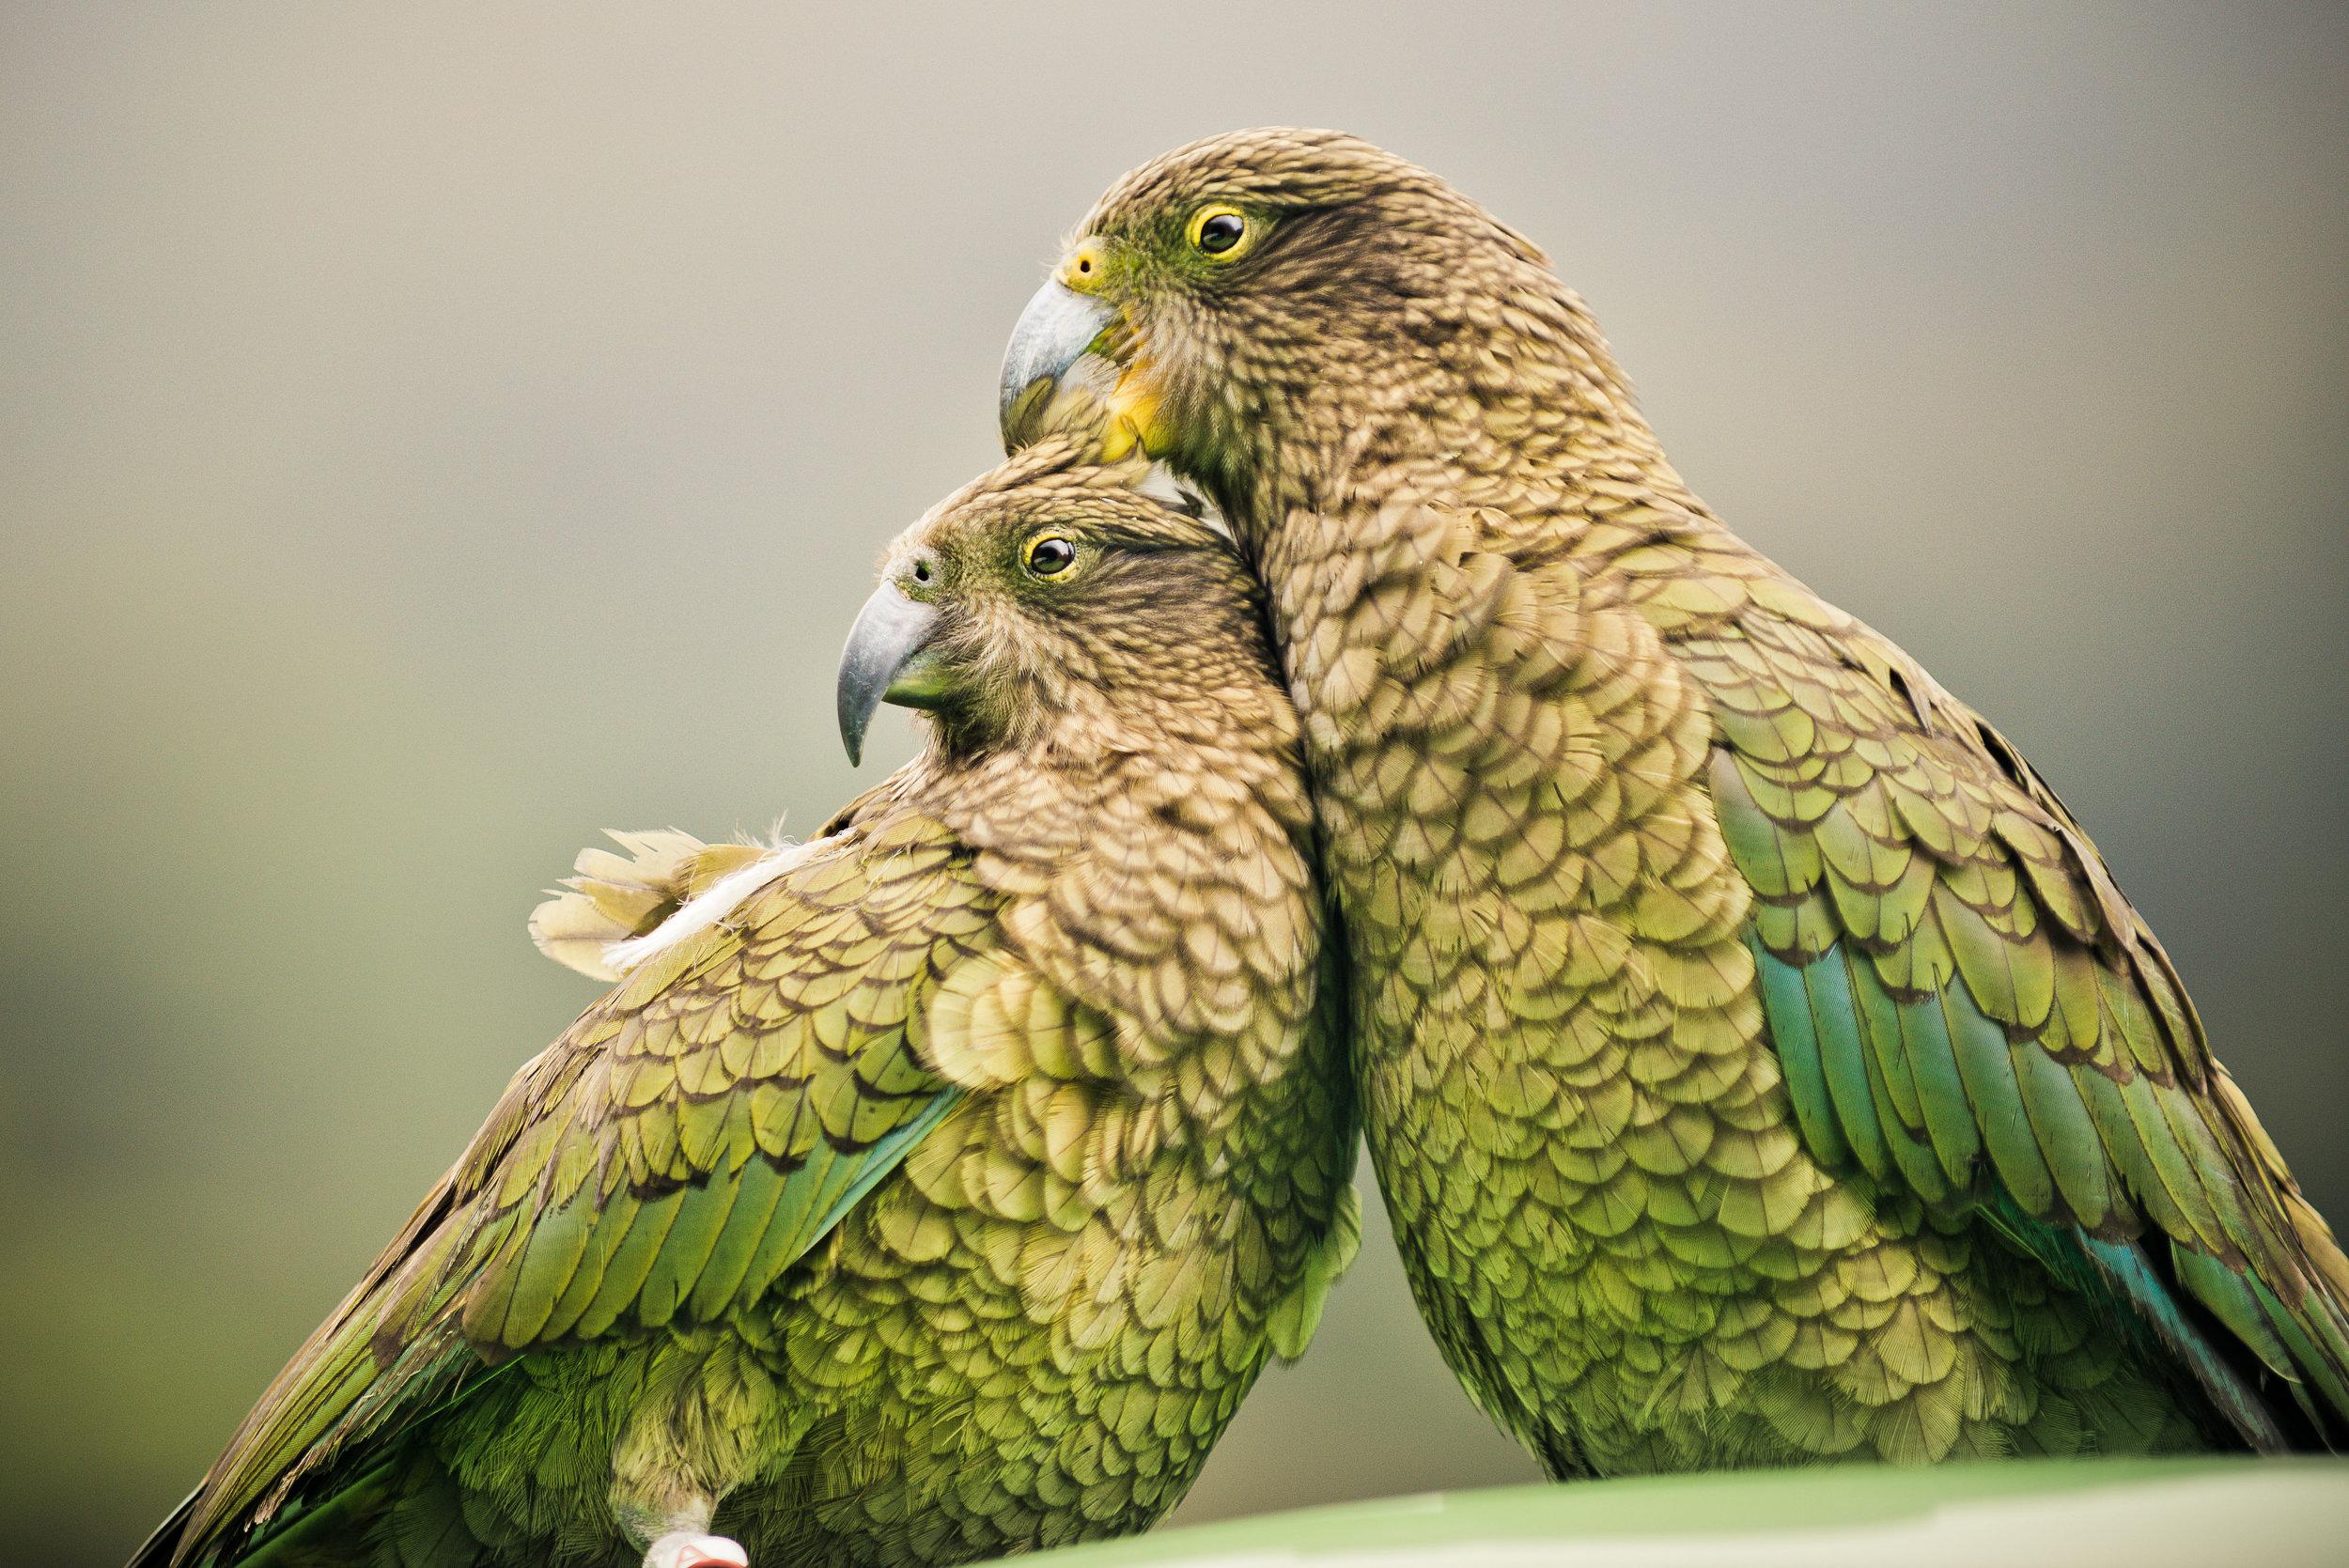 NZ Native Bird, The Kea